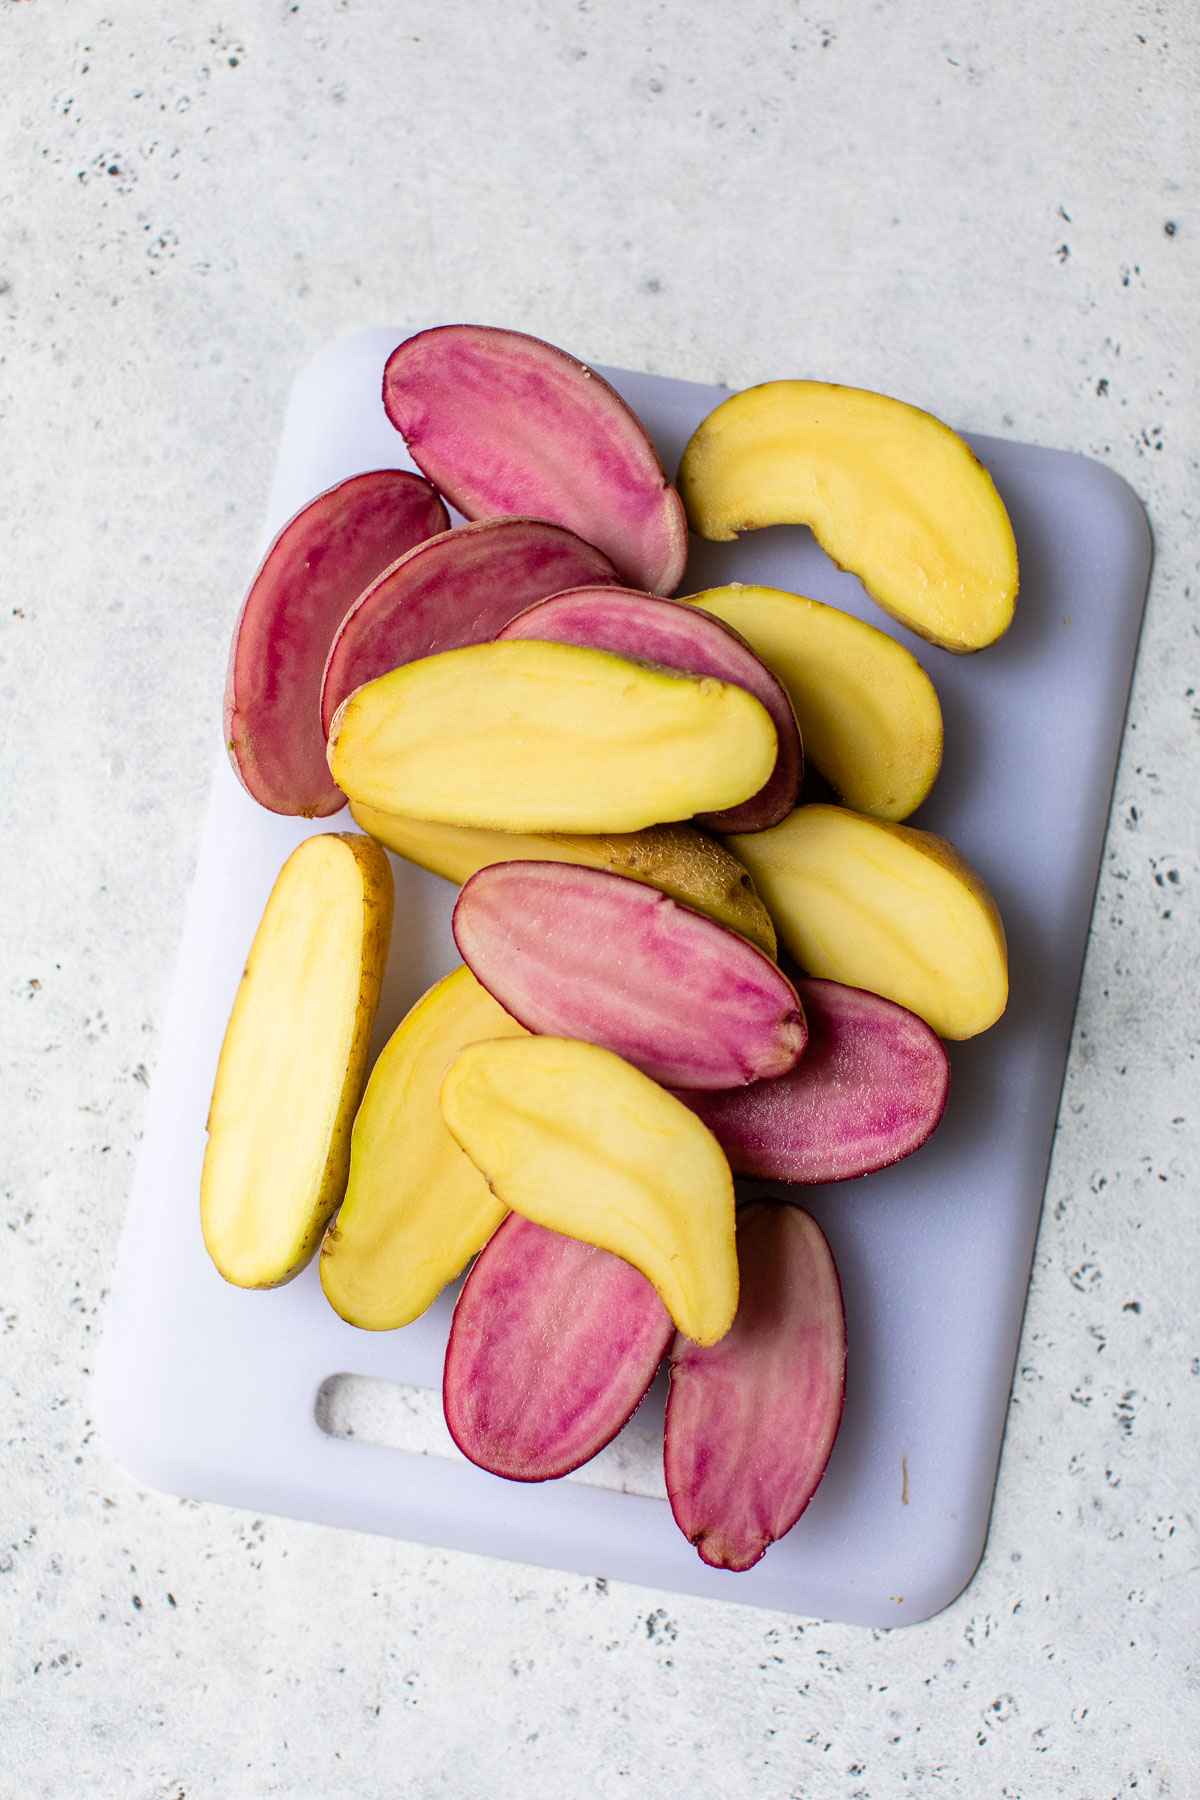 sliced potatoes on a cutting board